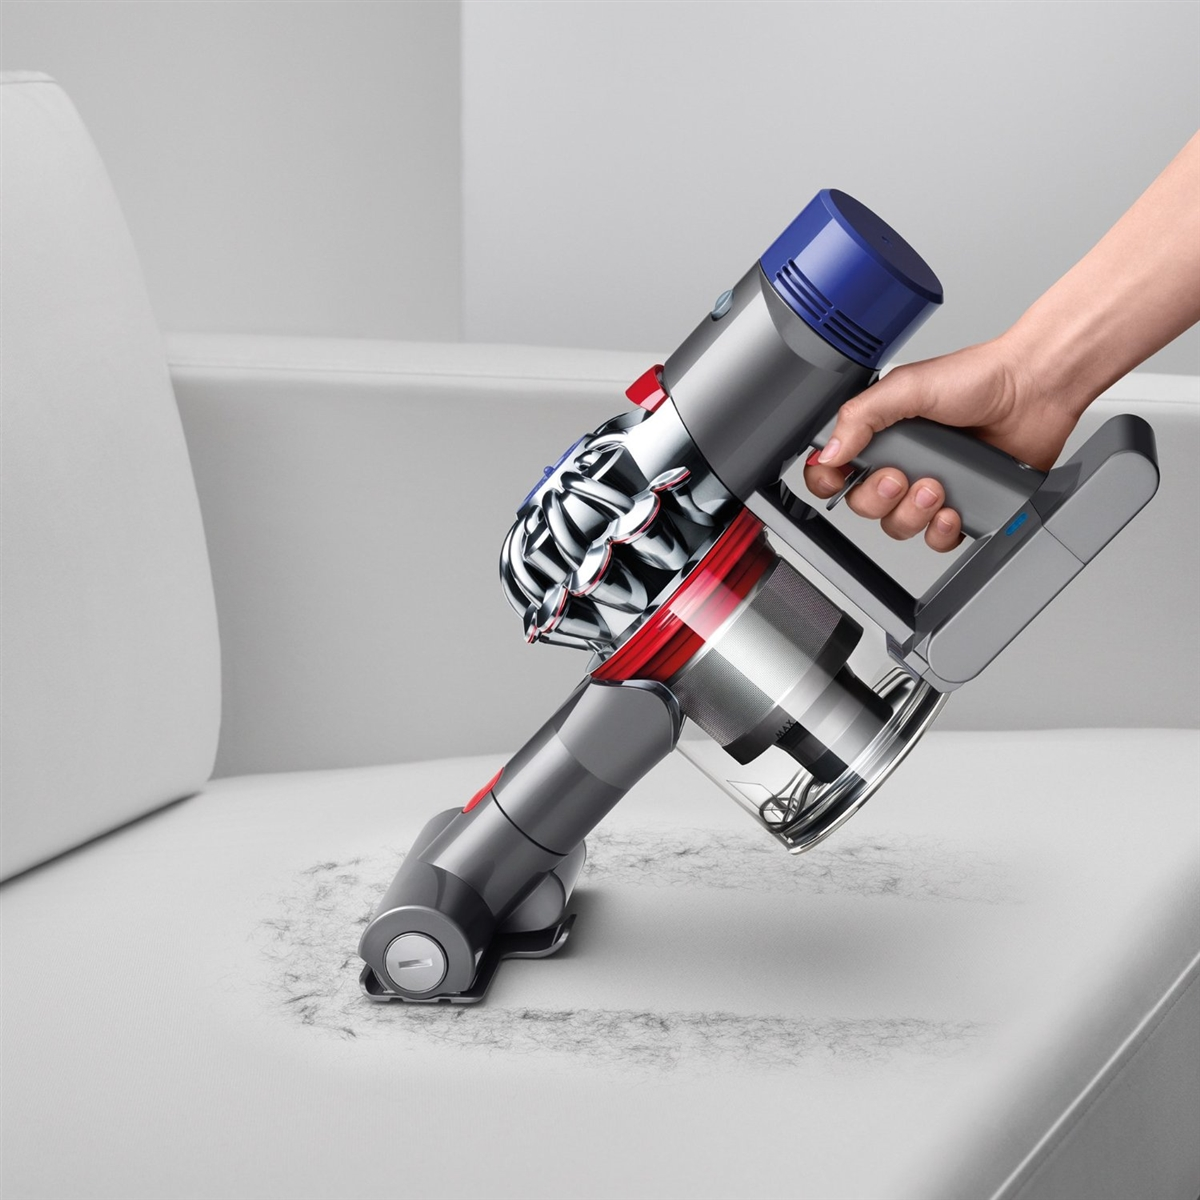 Dyson V8 Absolute Cord Free Vacuum 214730 01